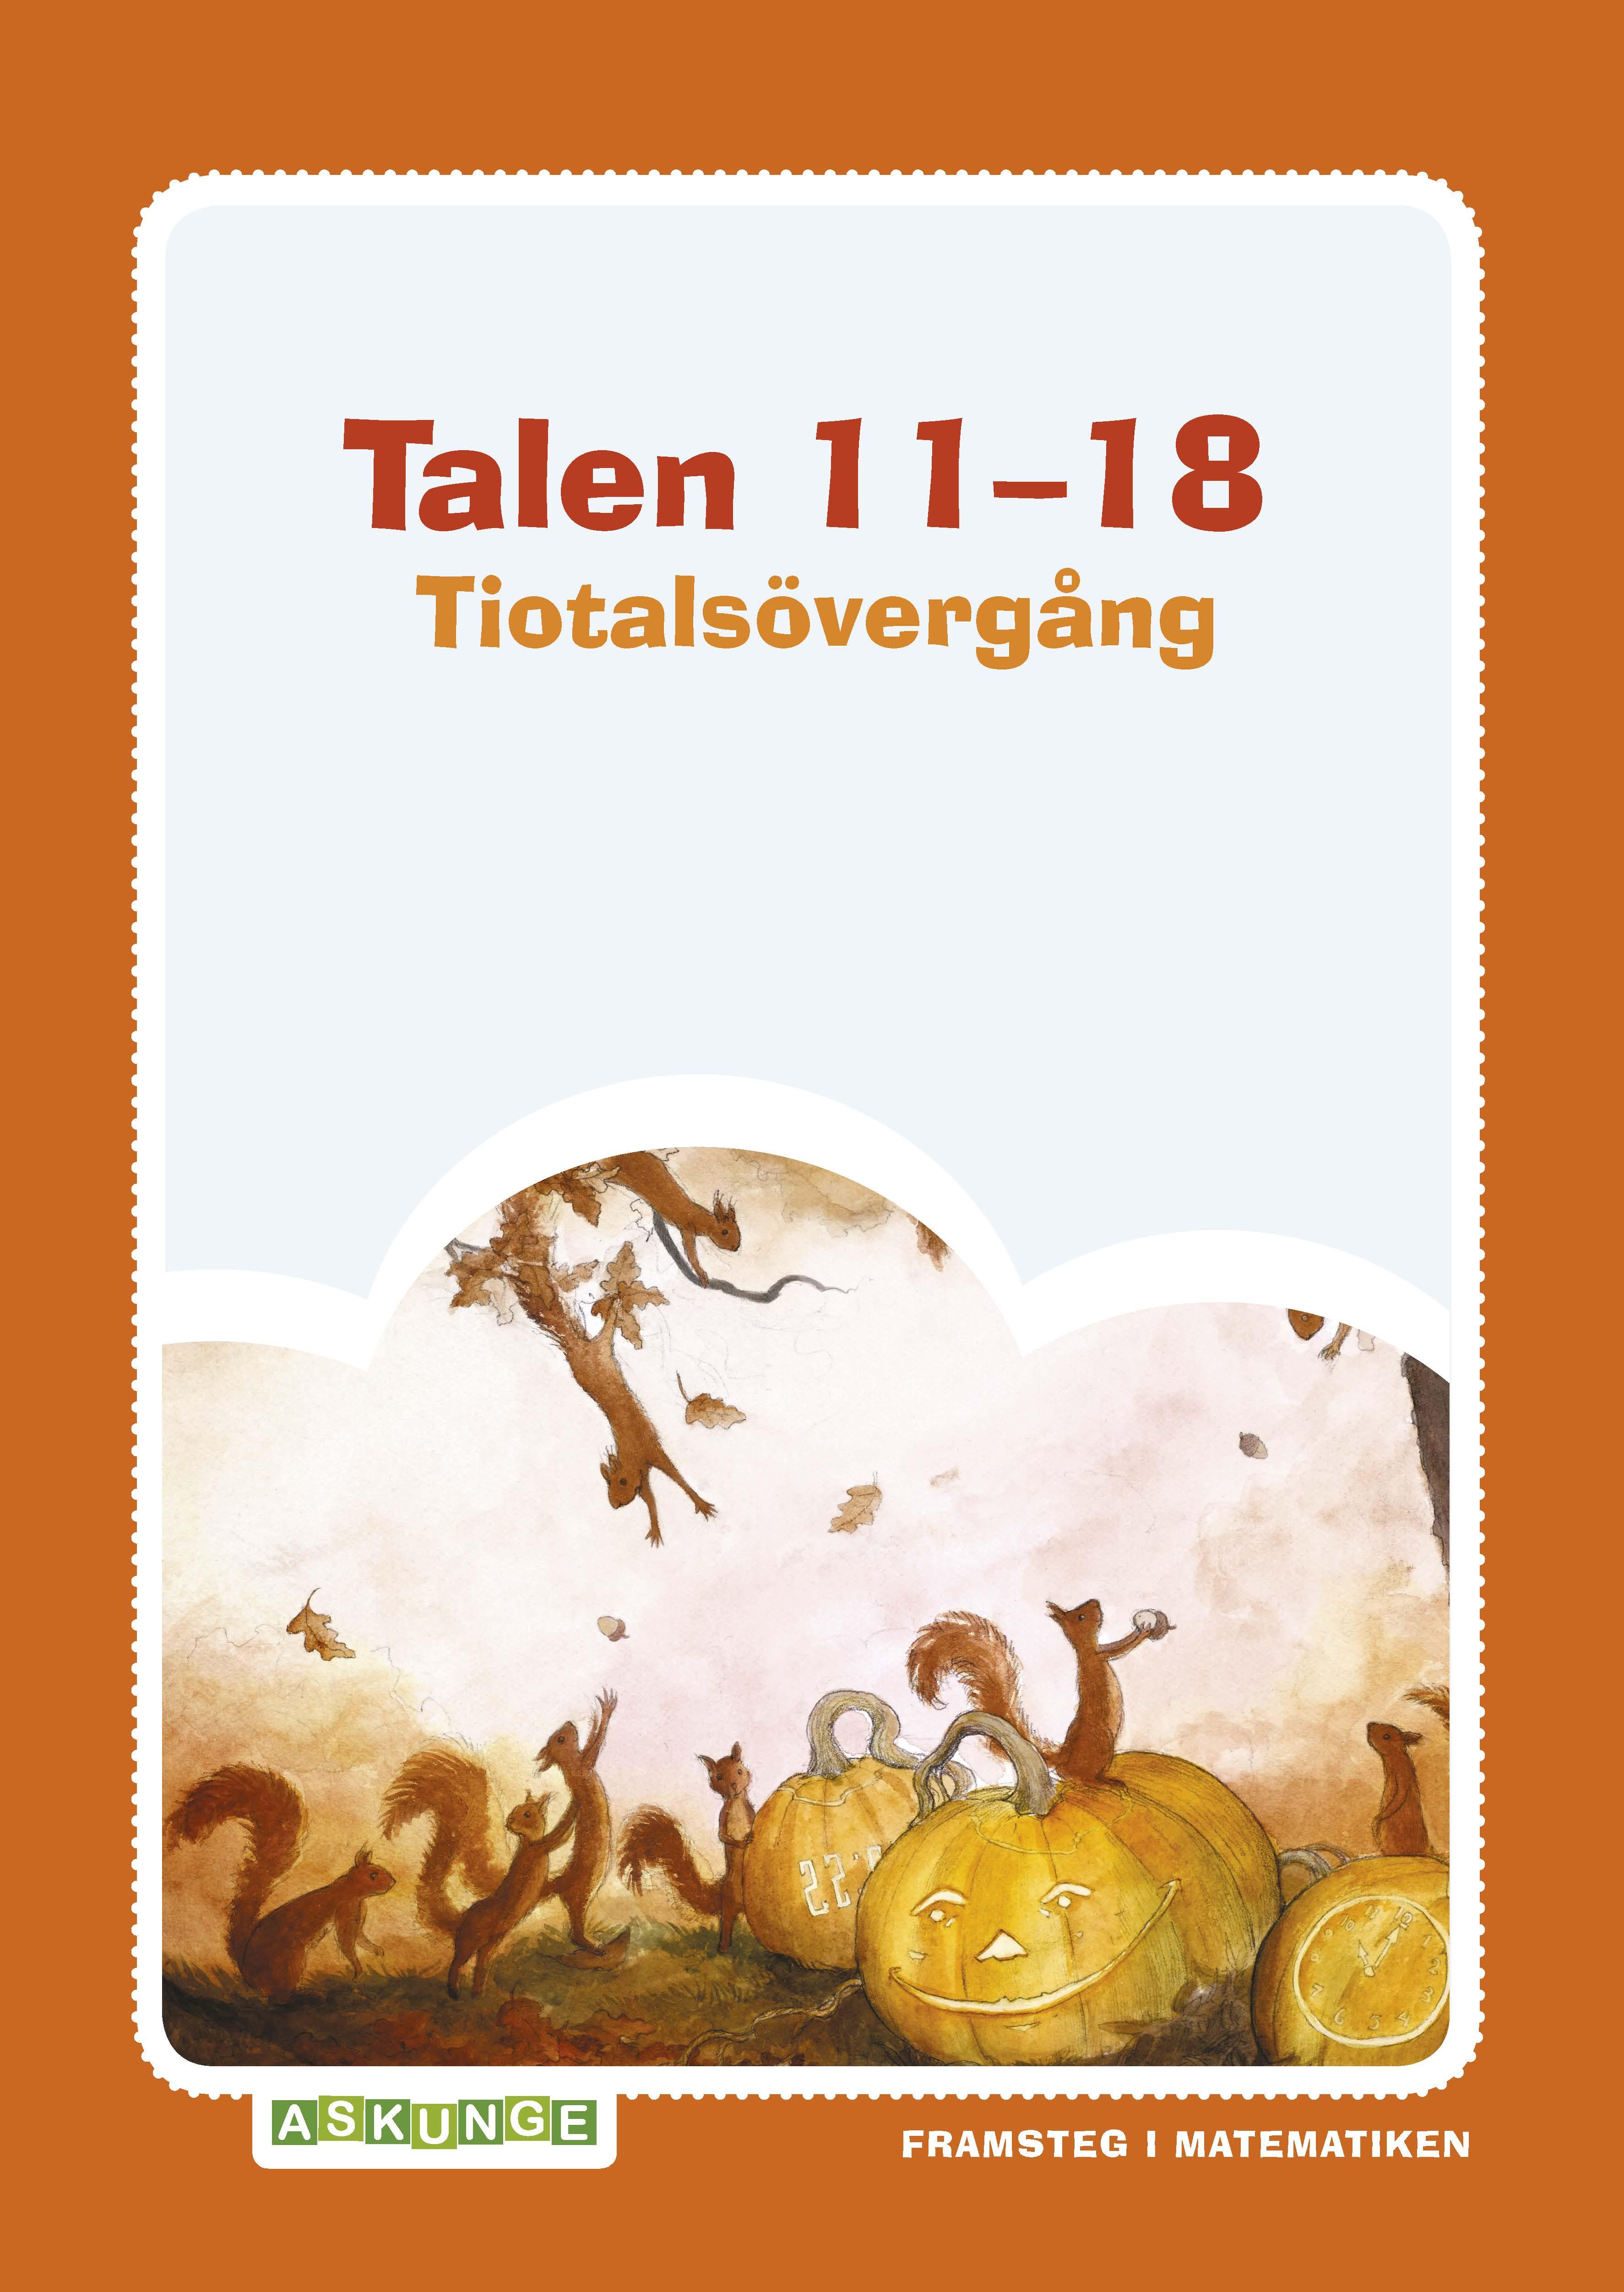 Framsteg Talen 11-18